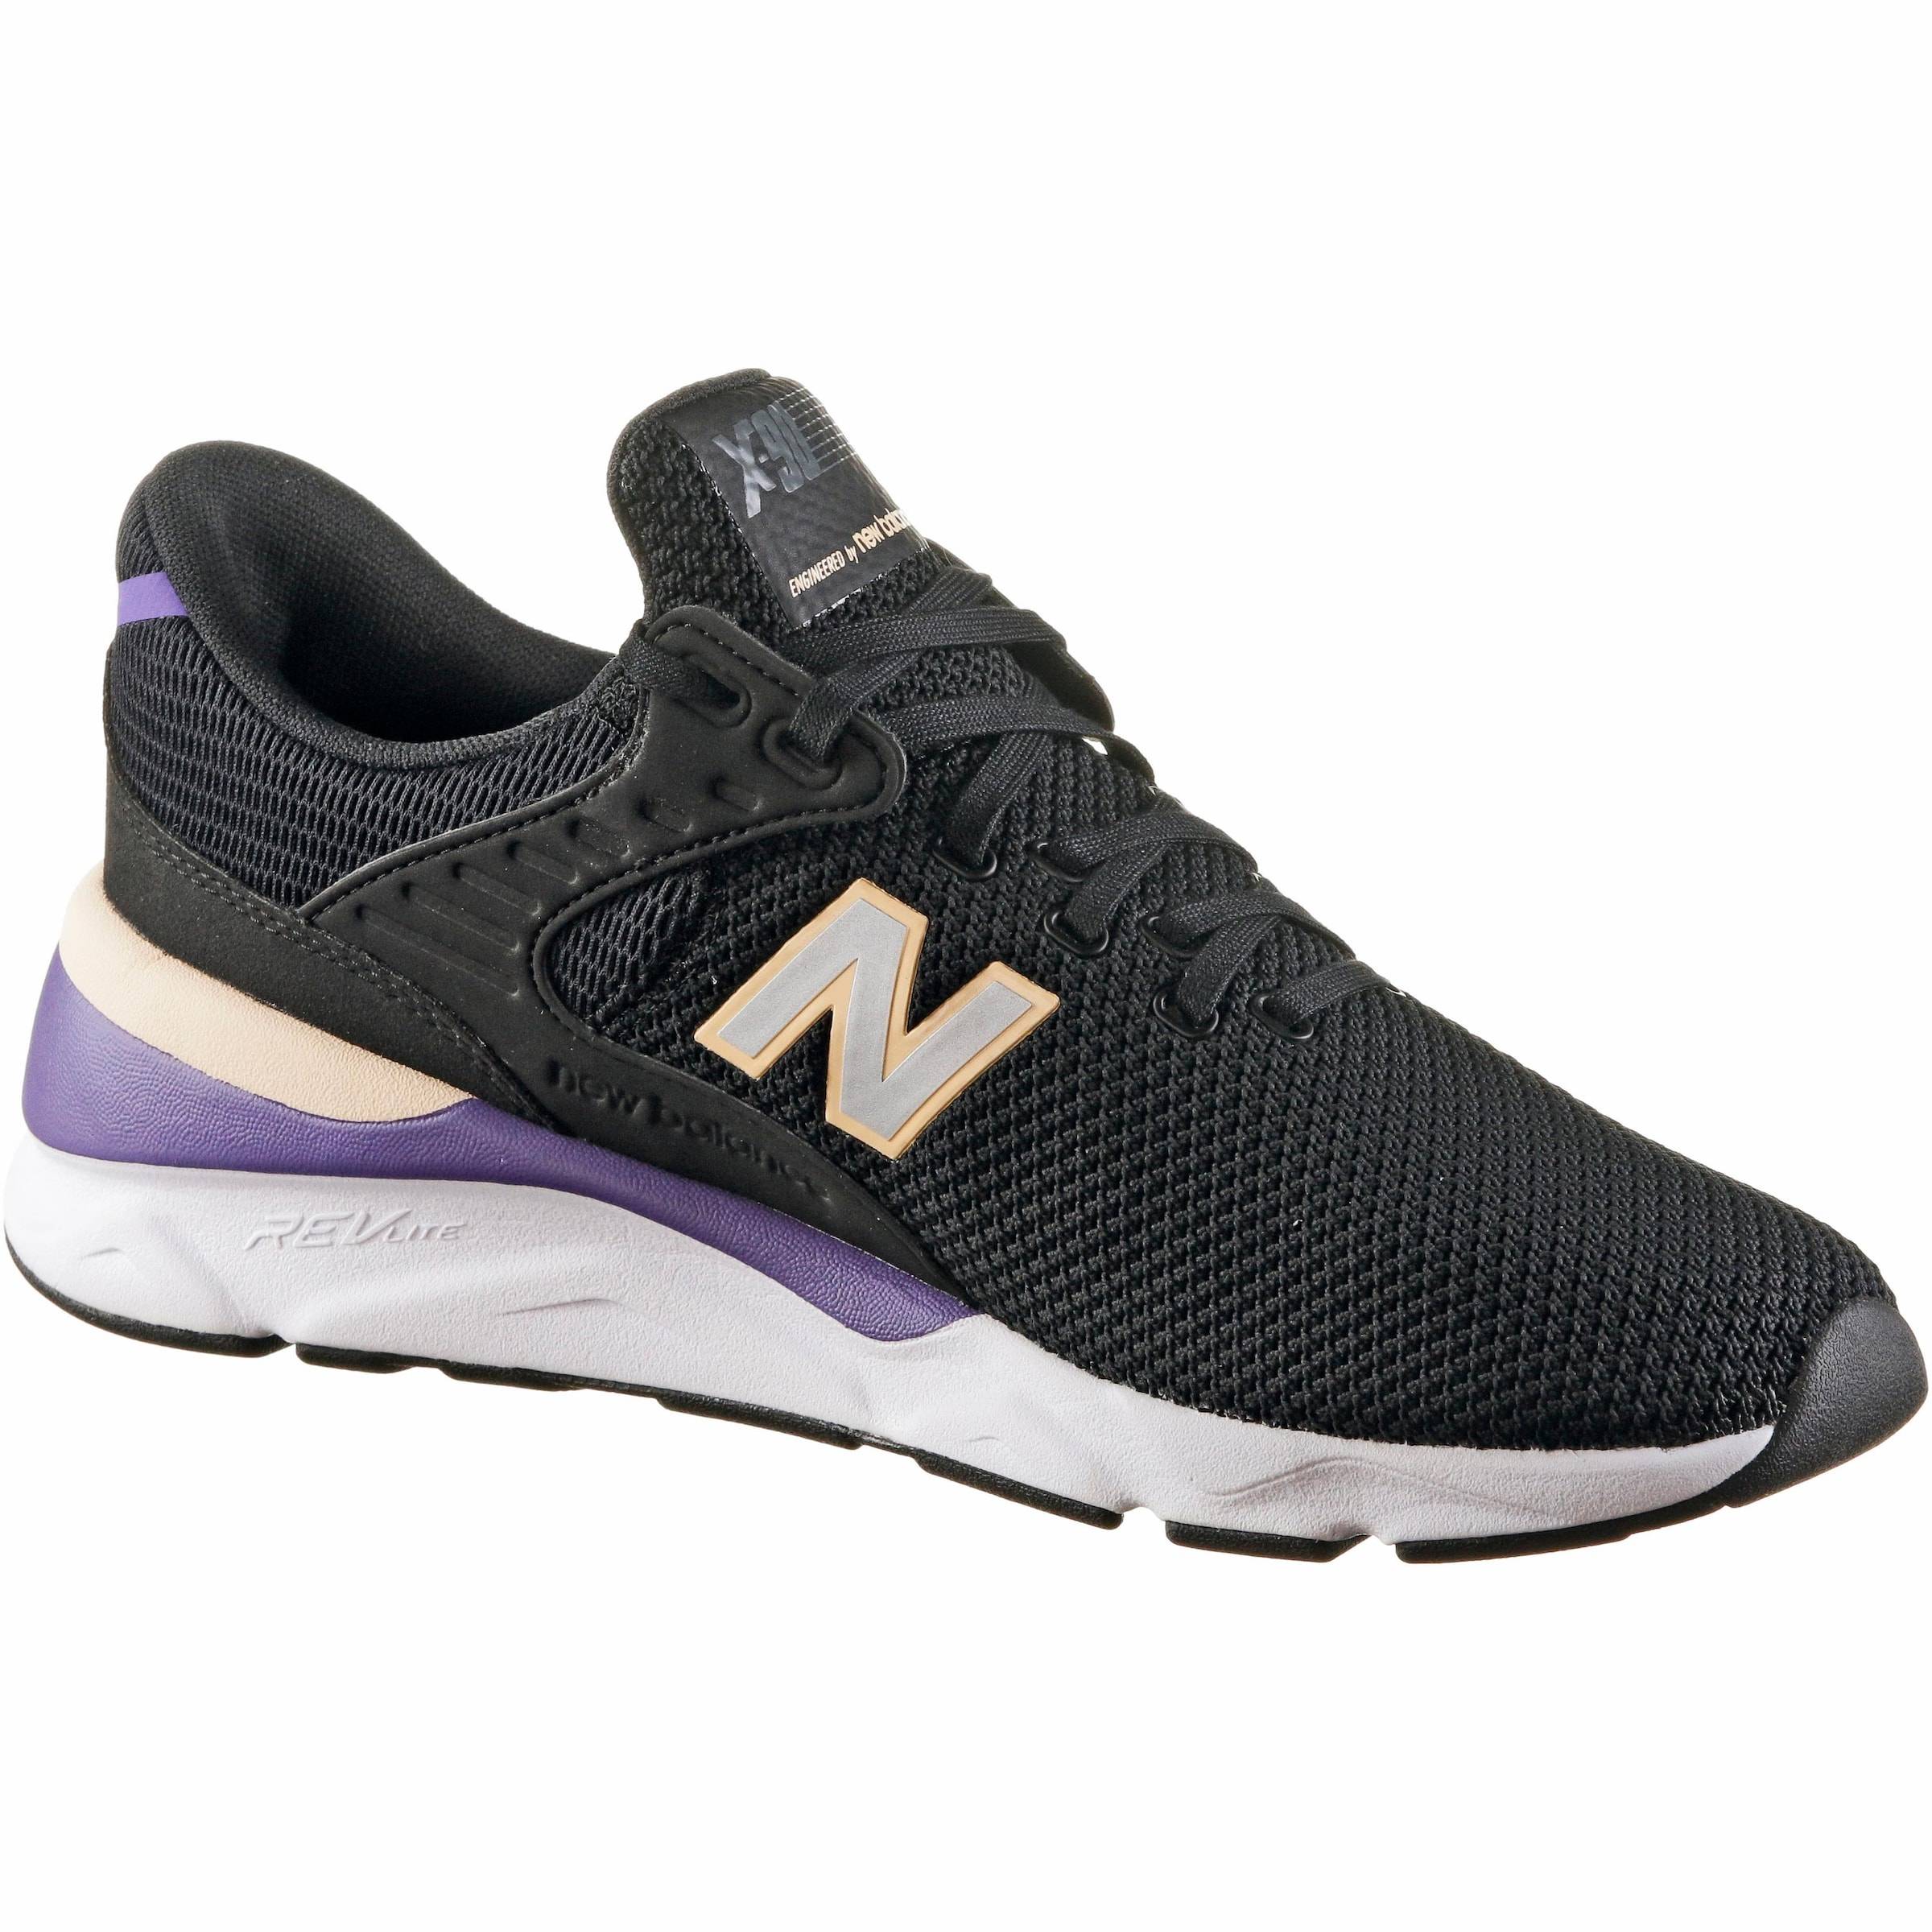 New Balance In Balance New Sneaker HelllilaSchwarz Yf7g6ybv